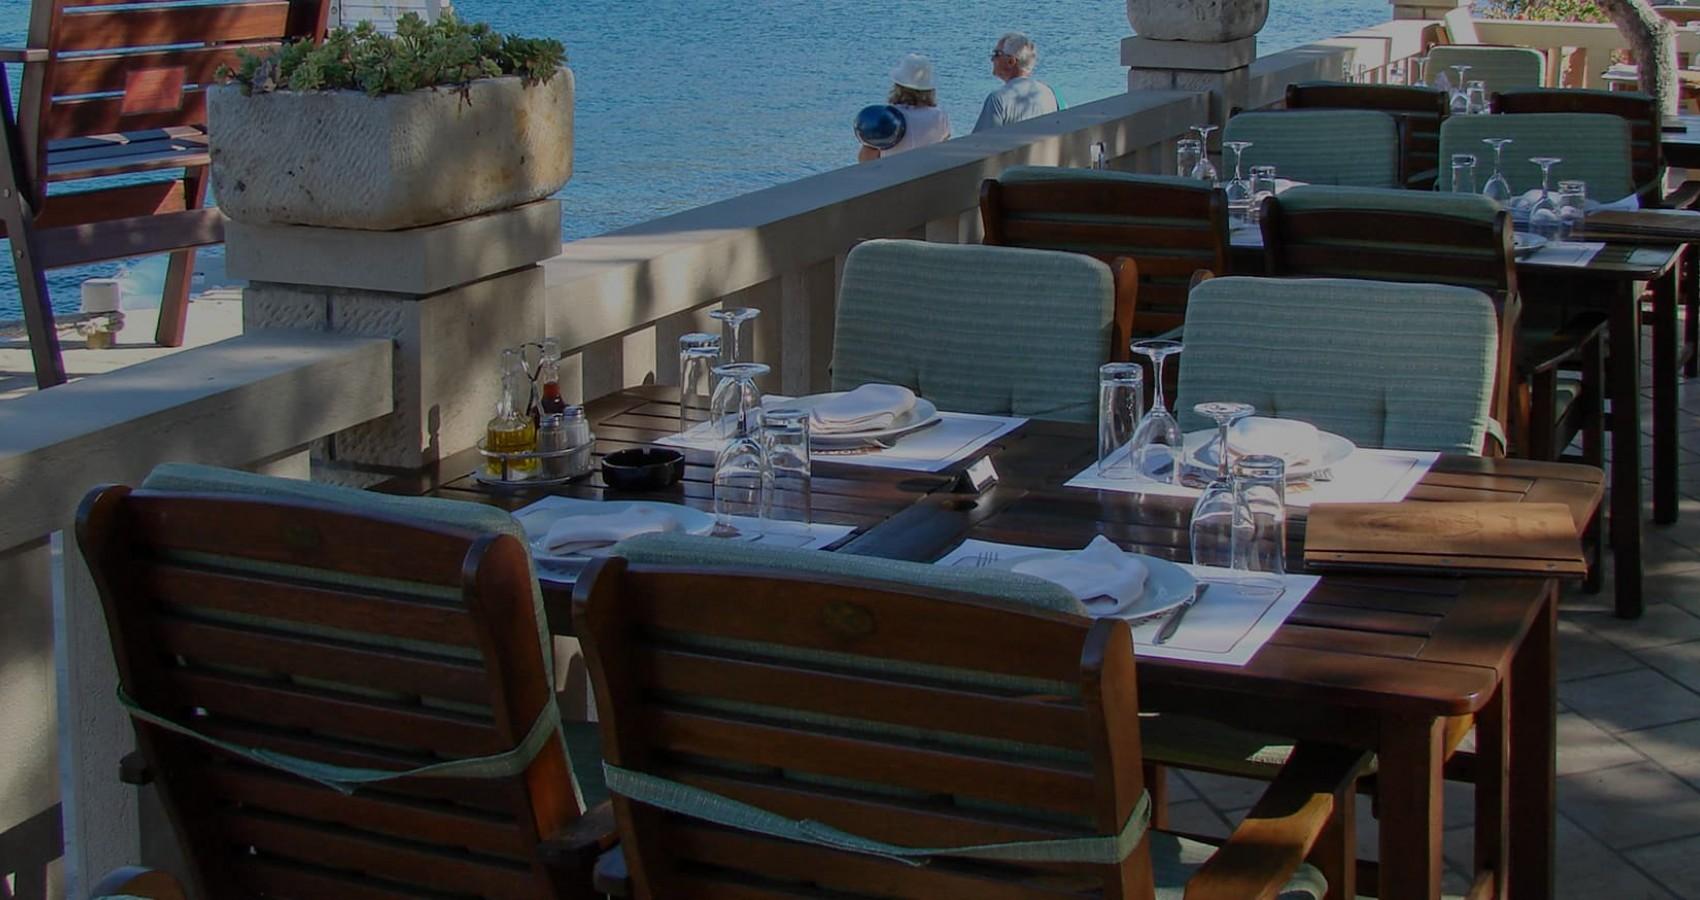 Restaurant mit Meeresblick Porto Rosso